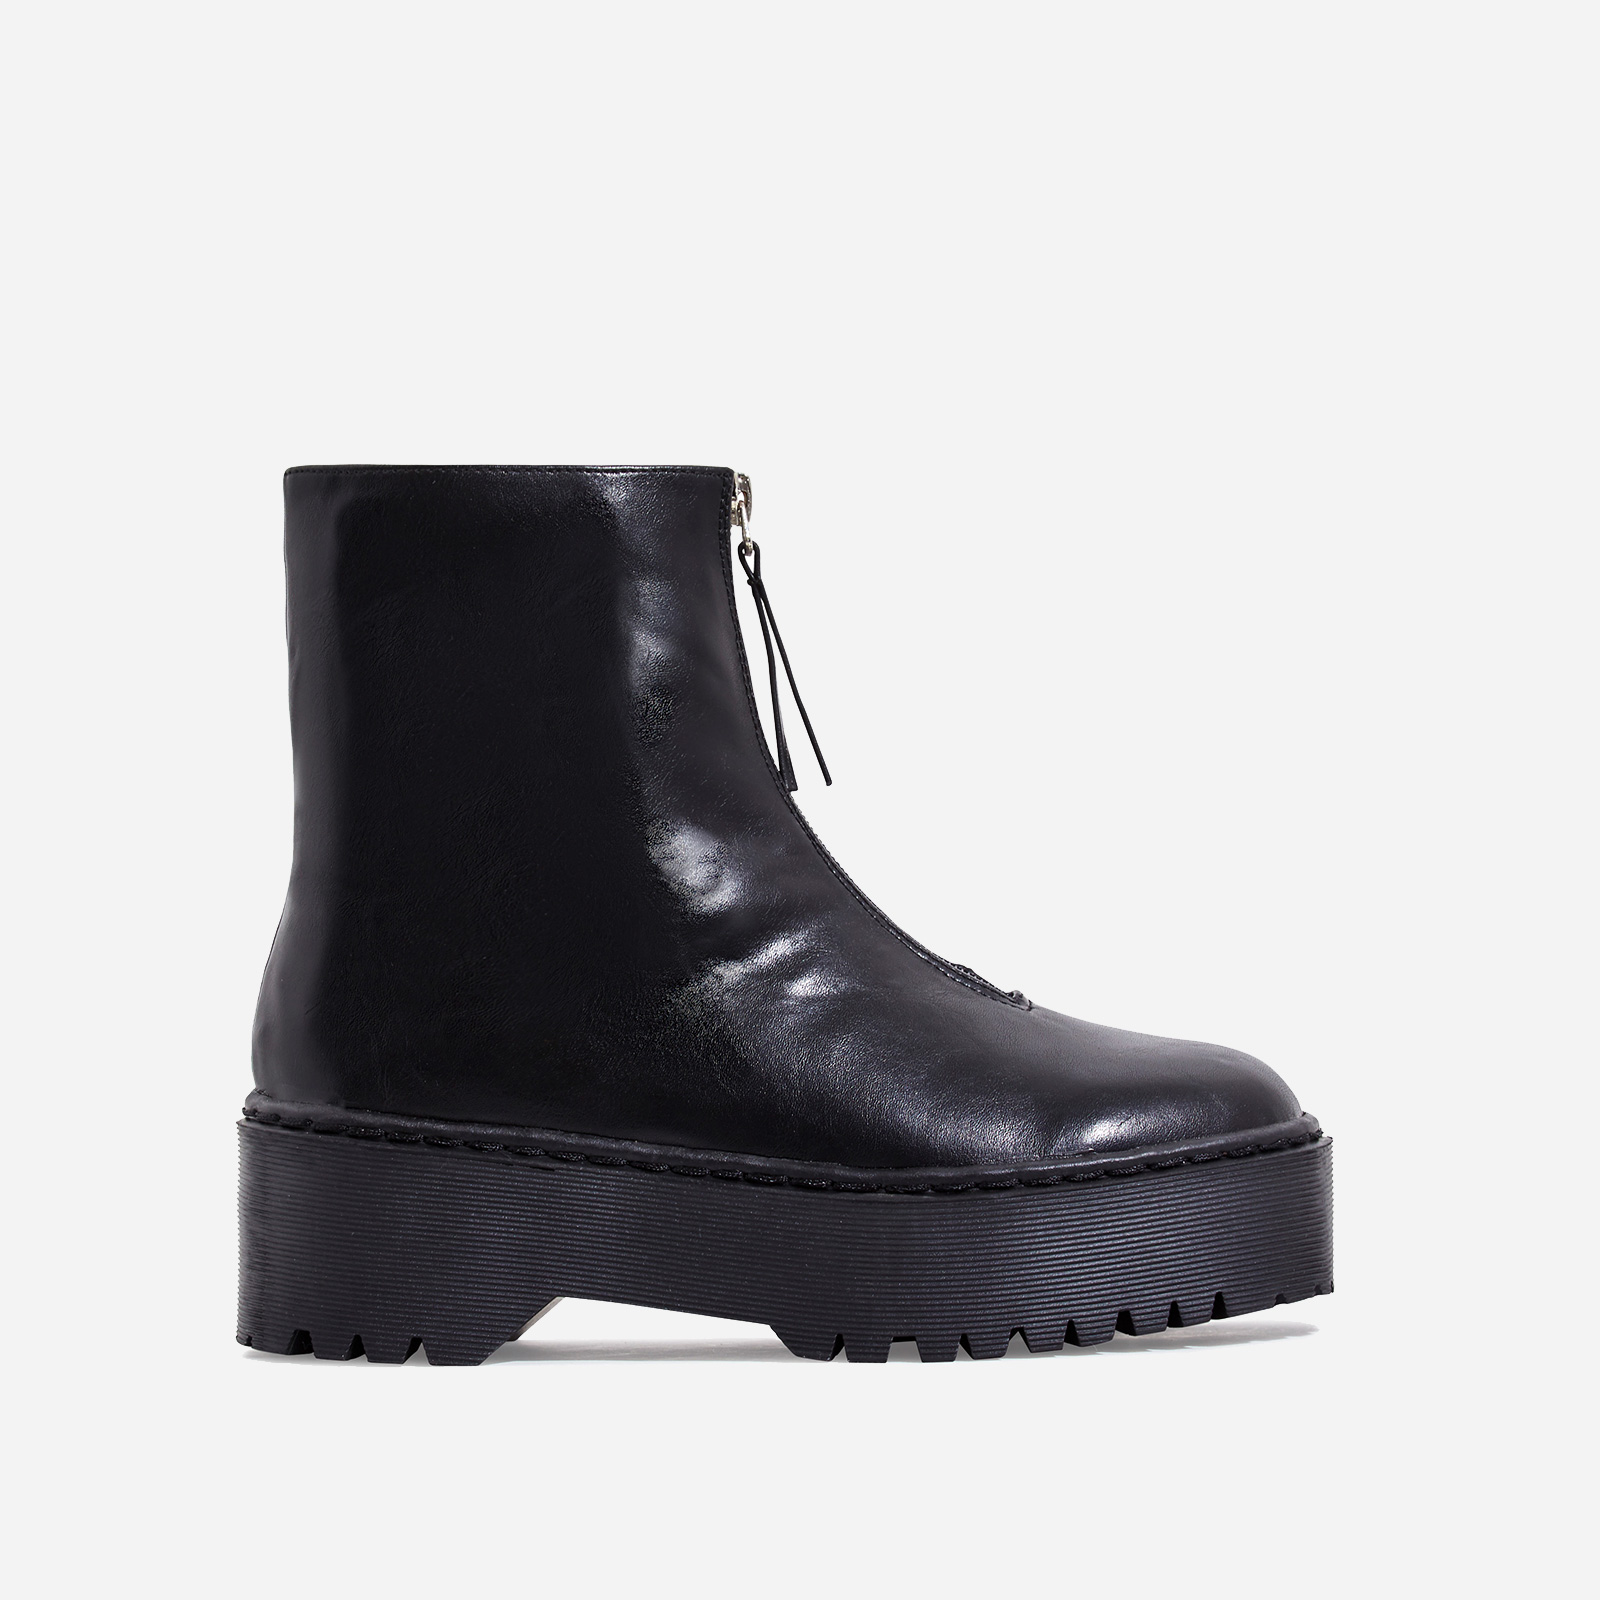 Centre Zip Detail Ankle Biker Boots In Black Faux Leather